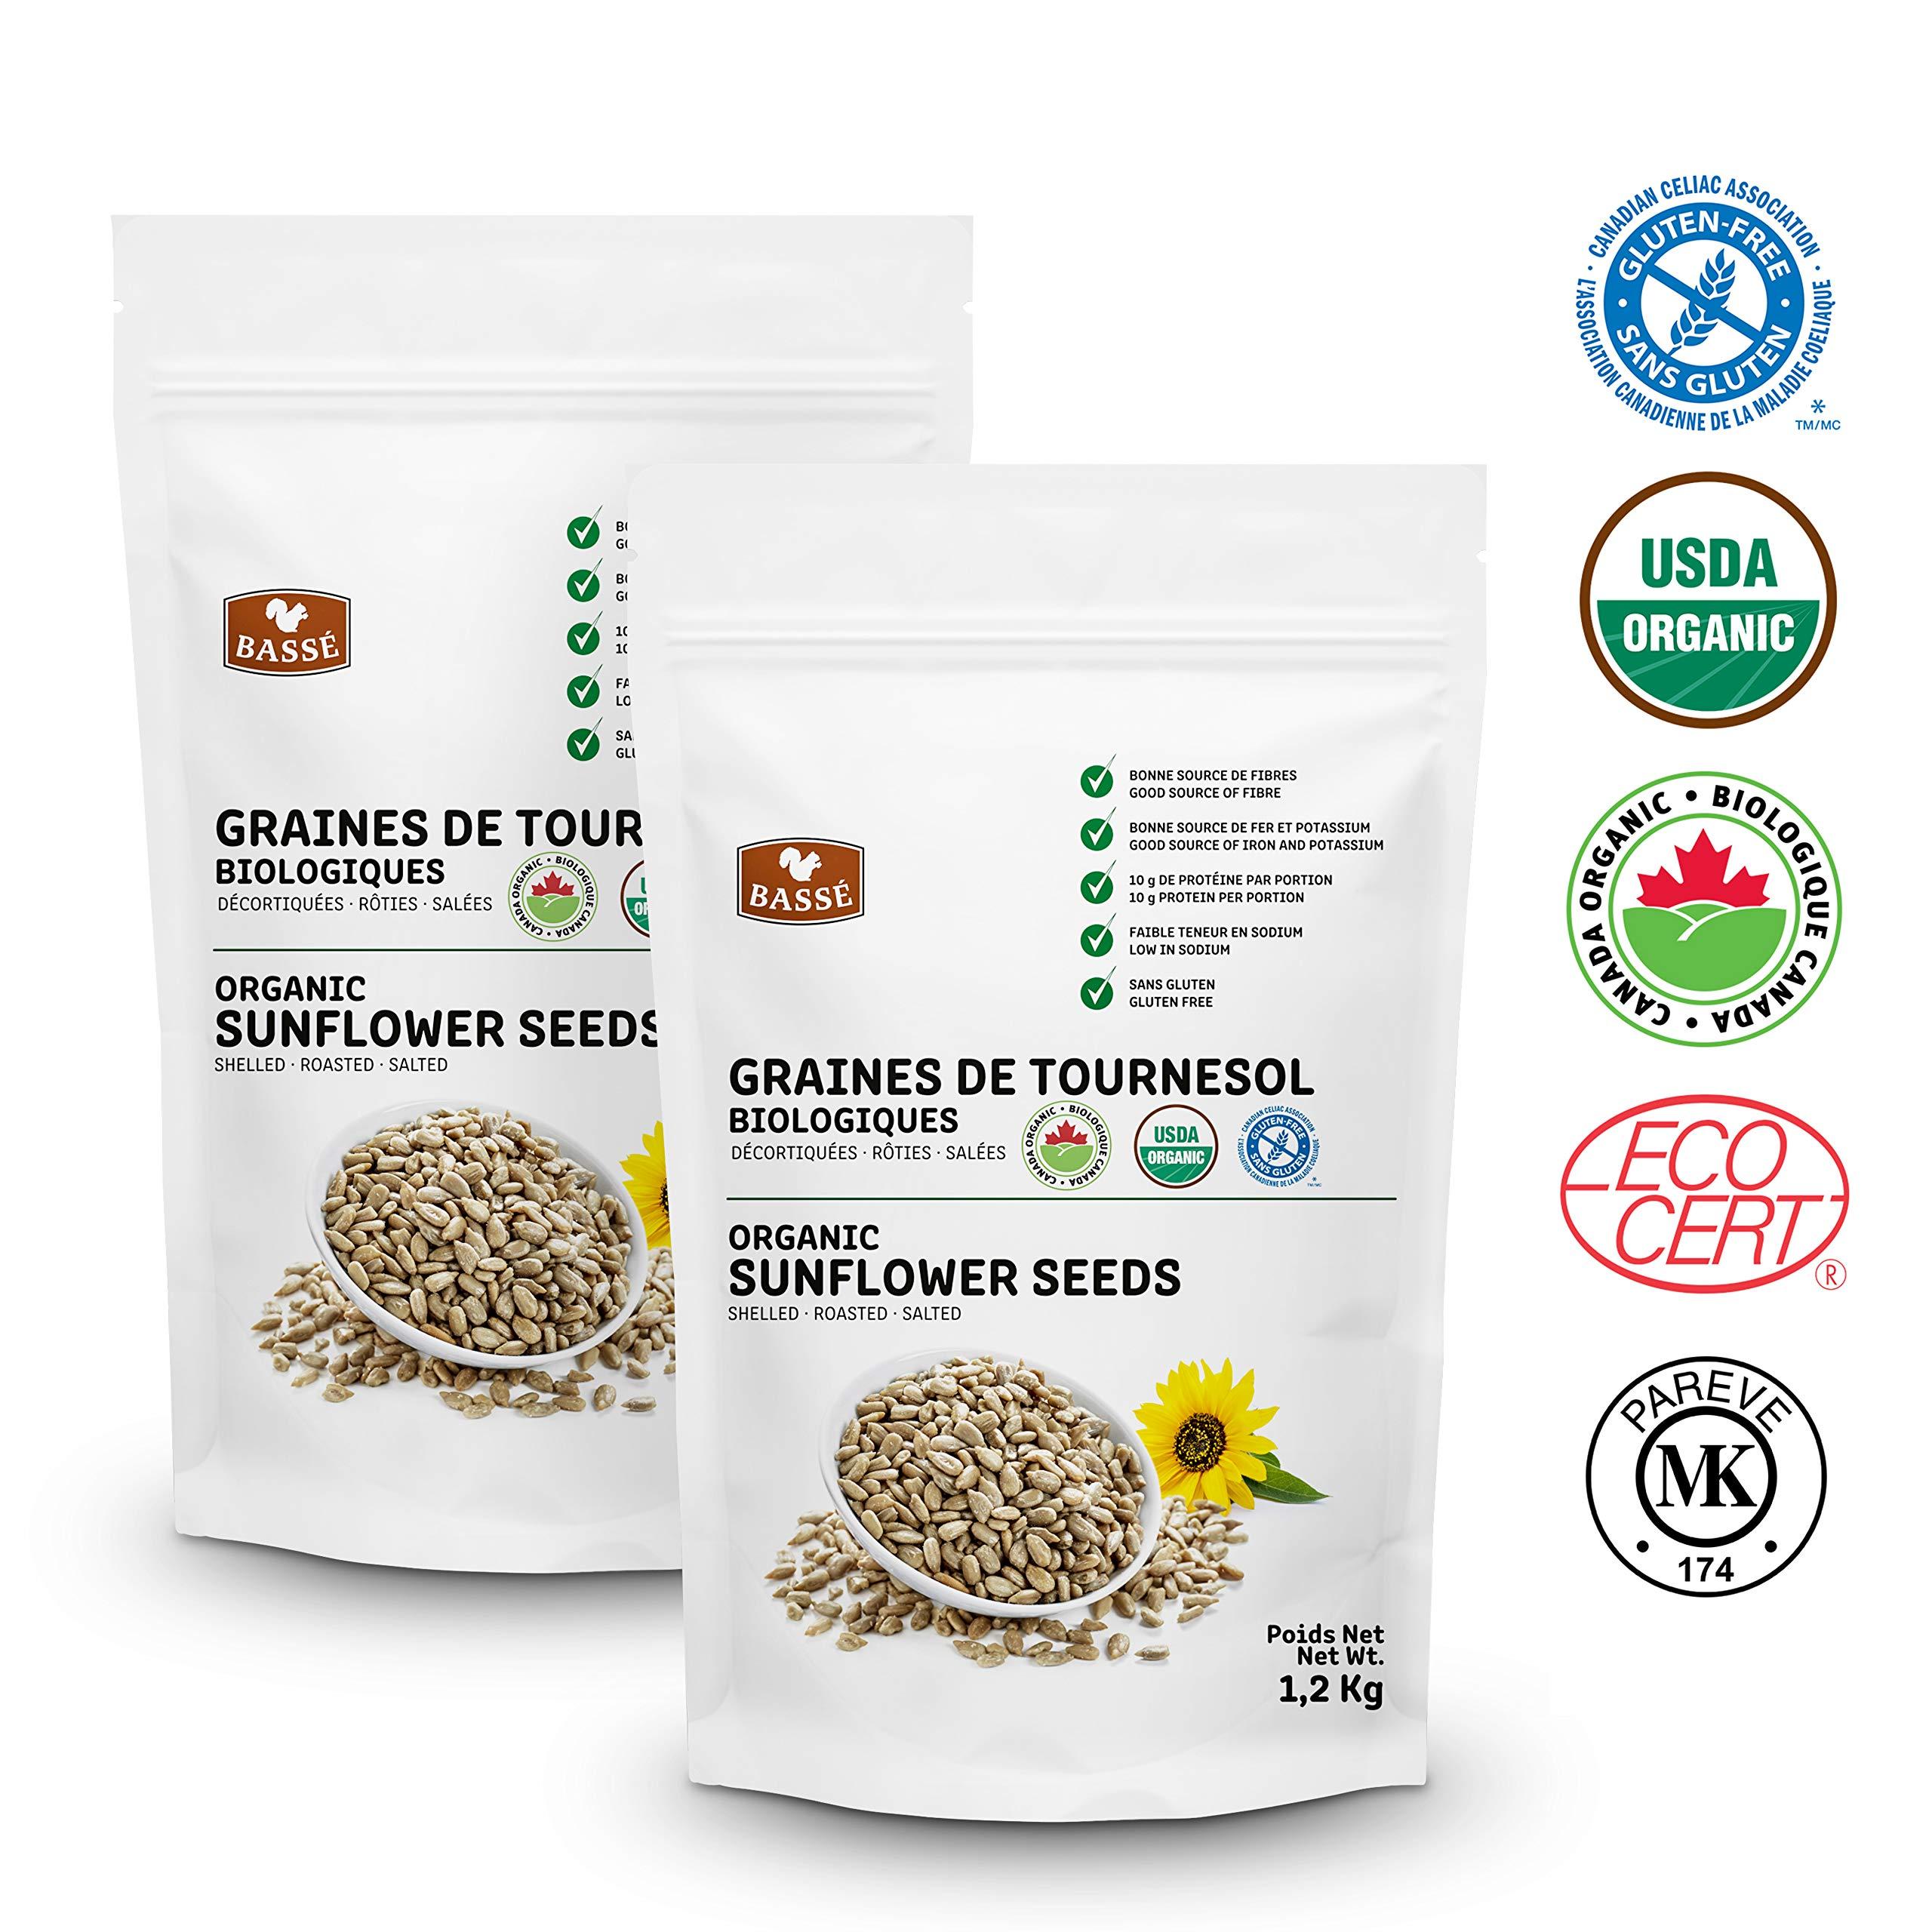 Basse Organic Sunflower Seeds, Gluten-Free – Kosher Certified 2 Resealable Bags (2.6 Pounds each)